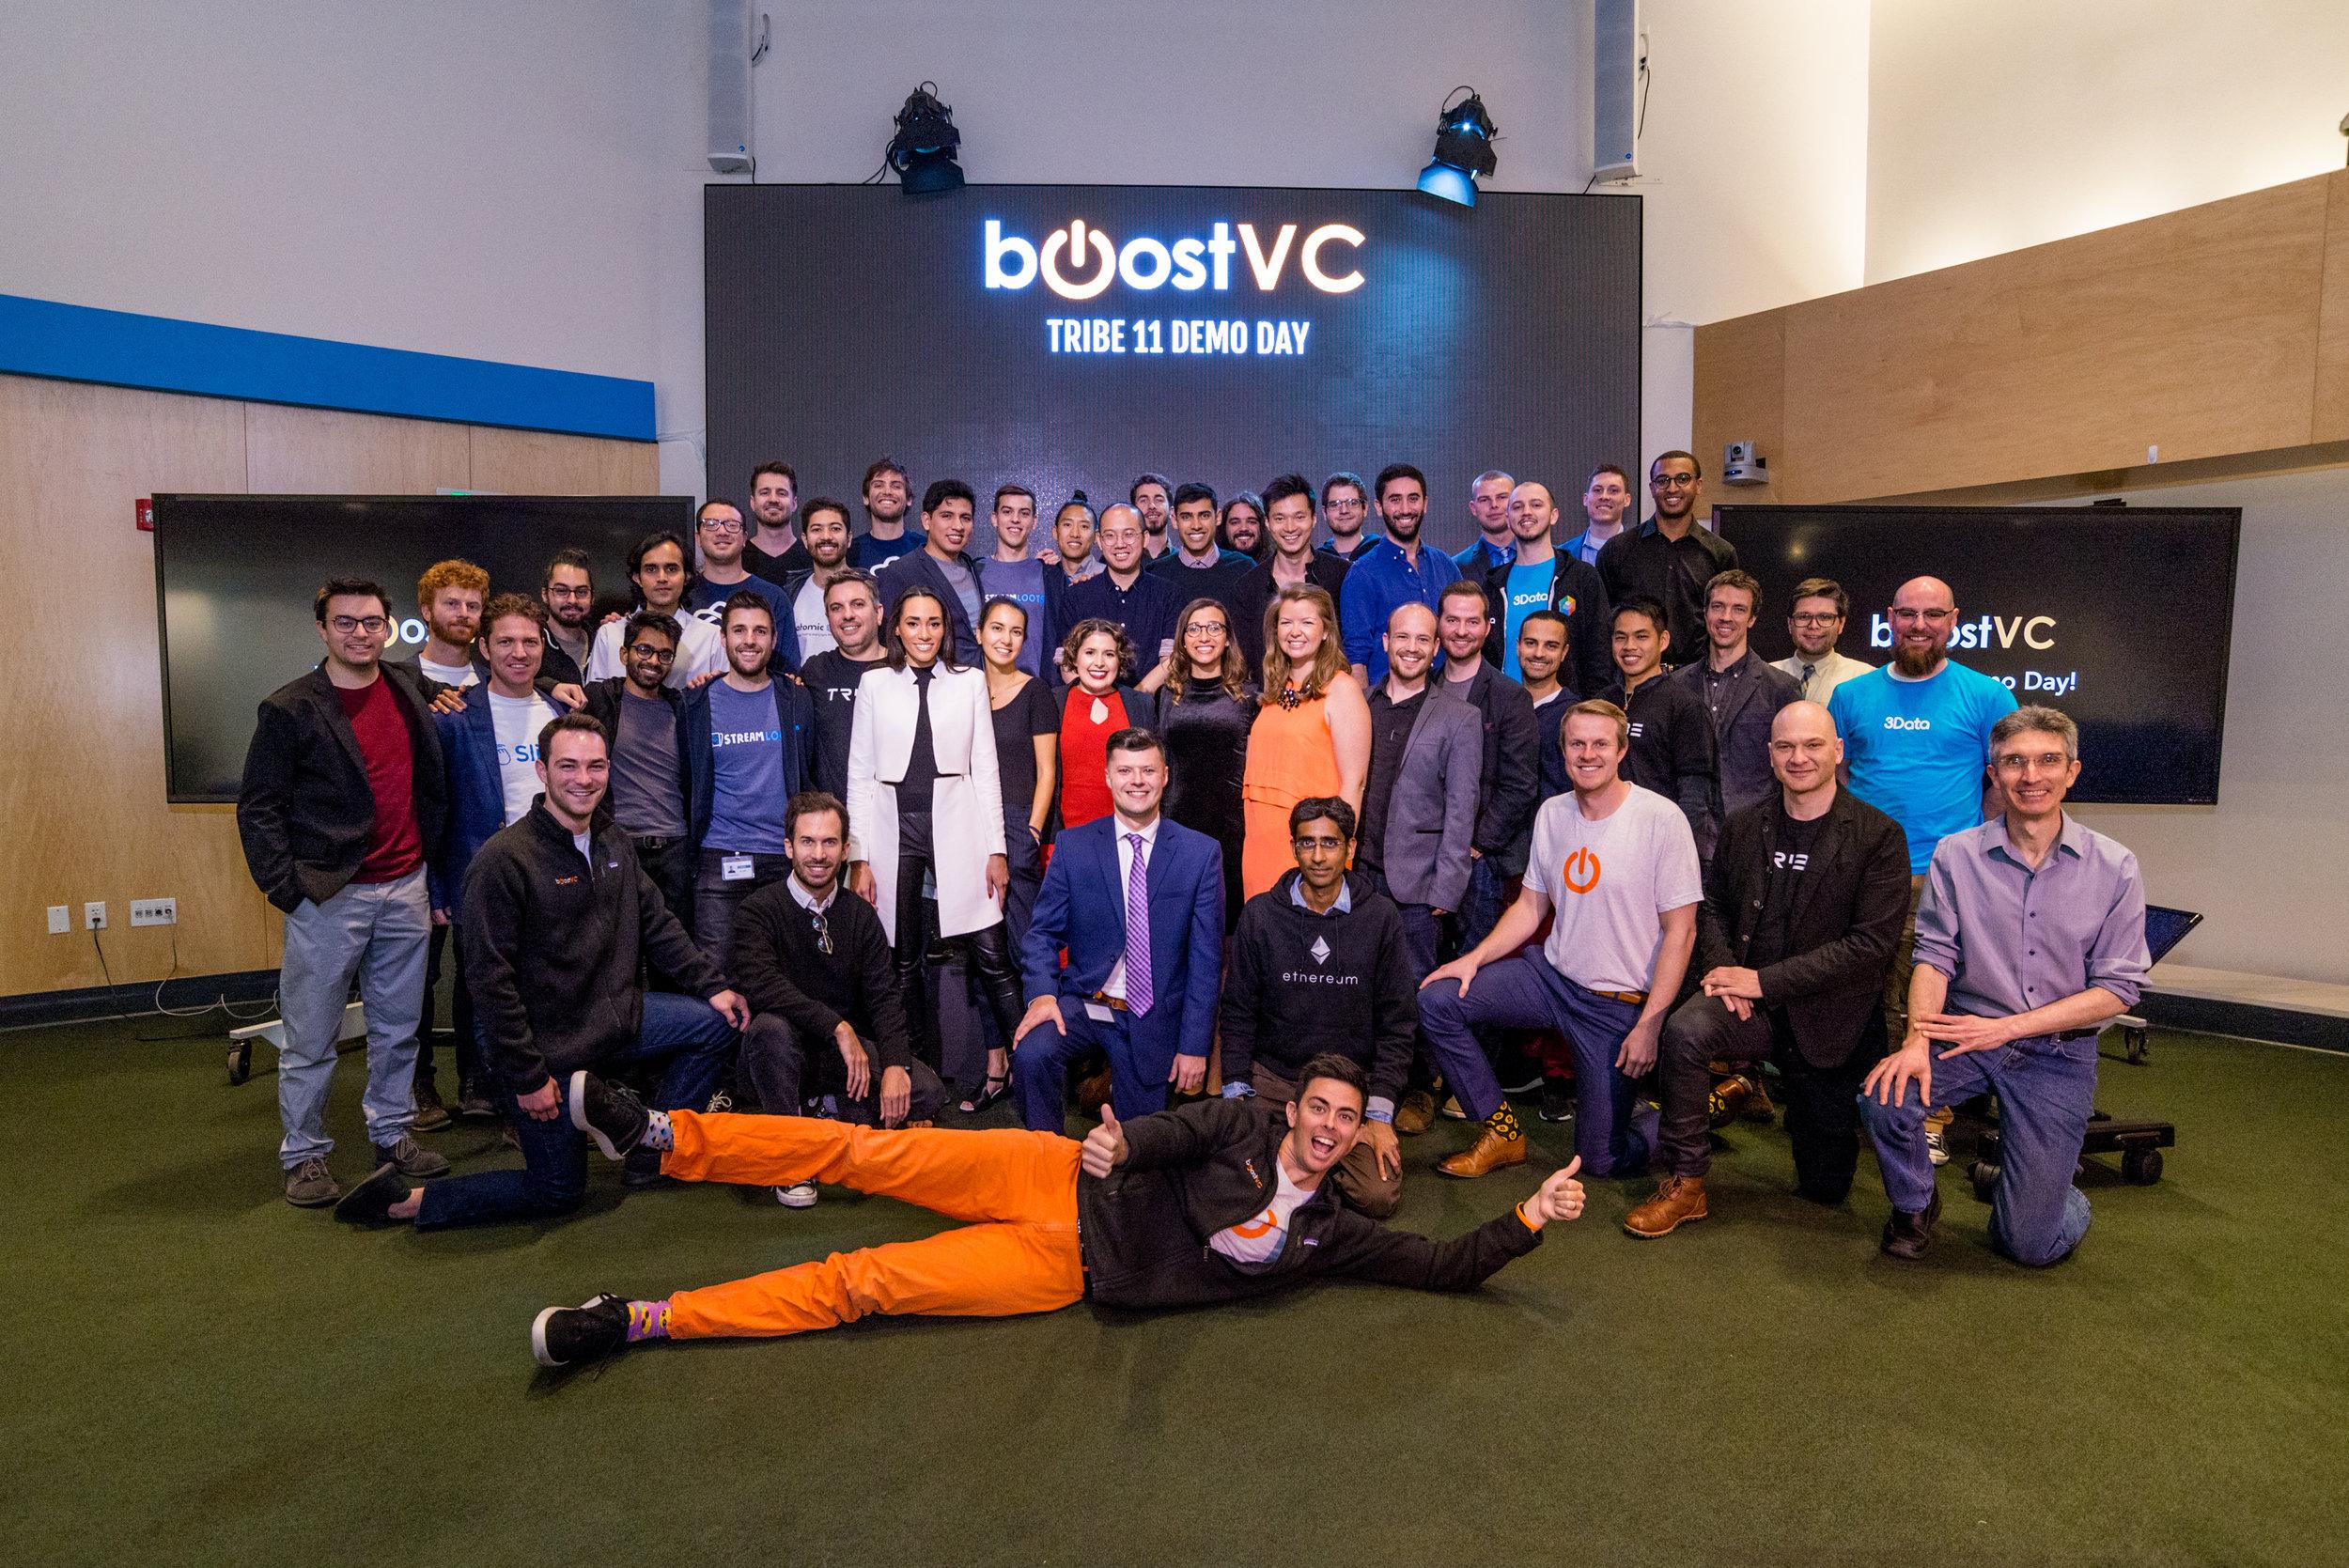 Boost VC Demon Day, April 2018. Photo by Alex Akamine.